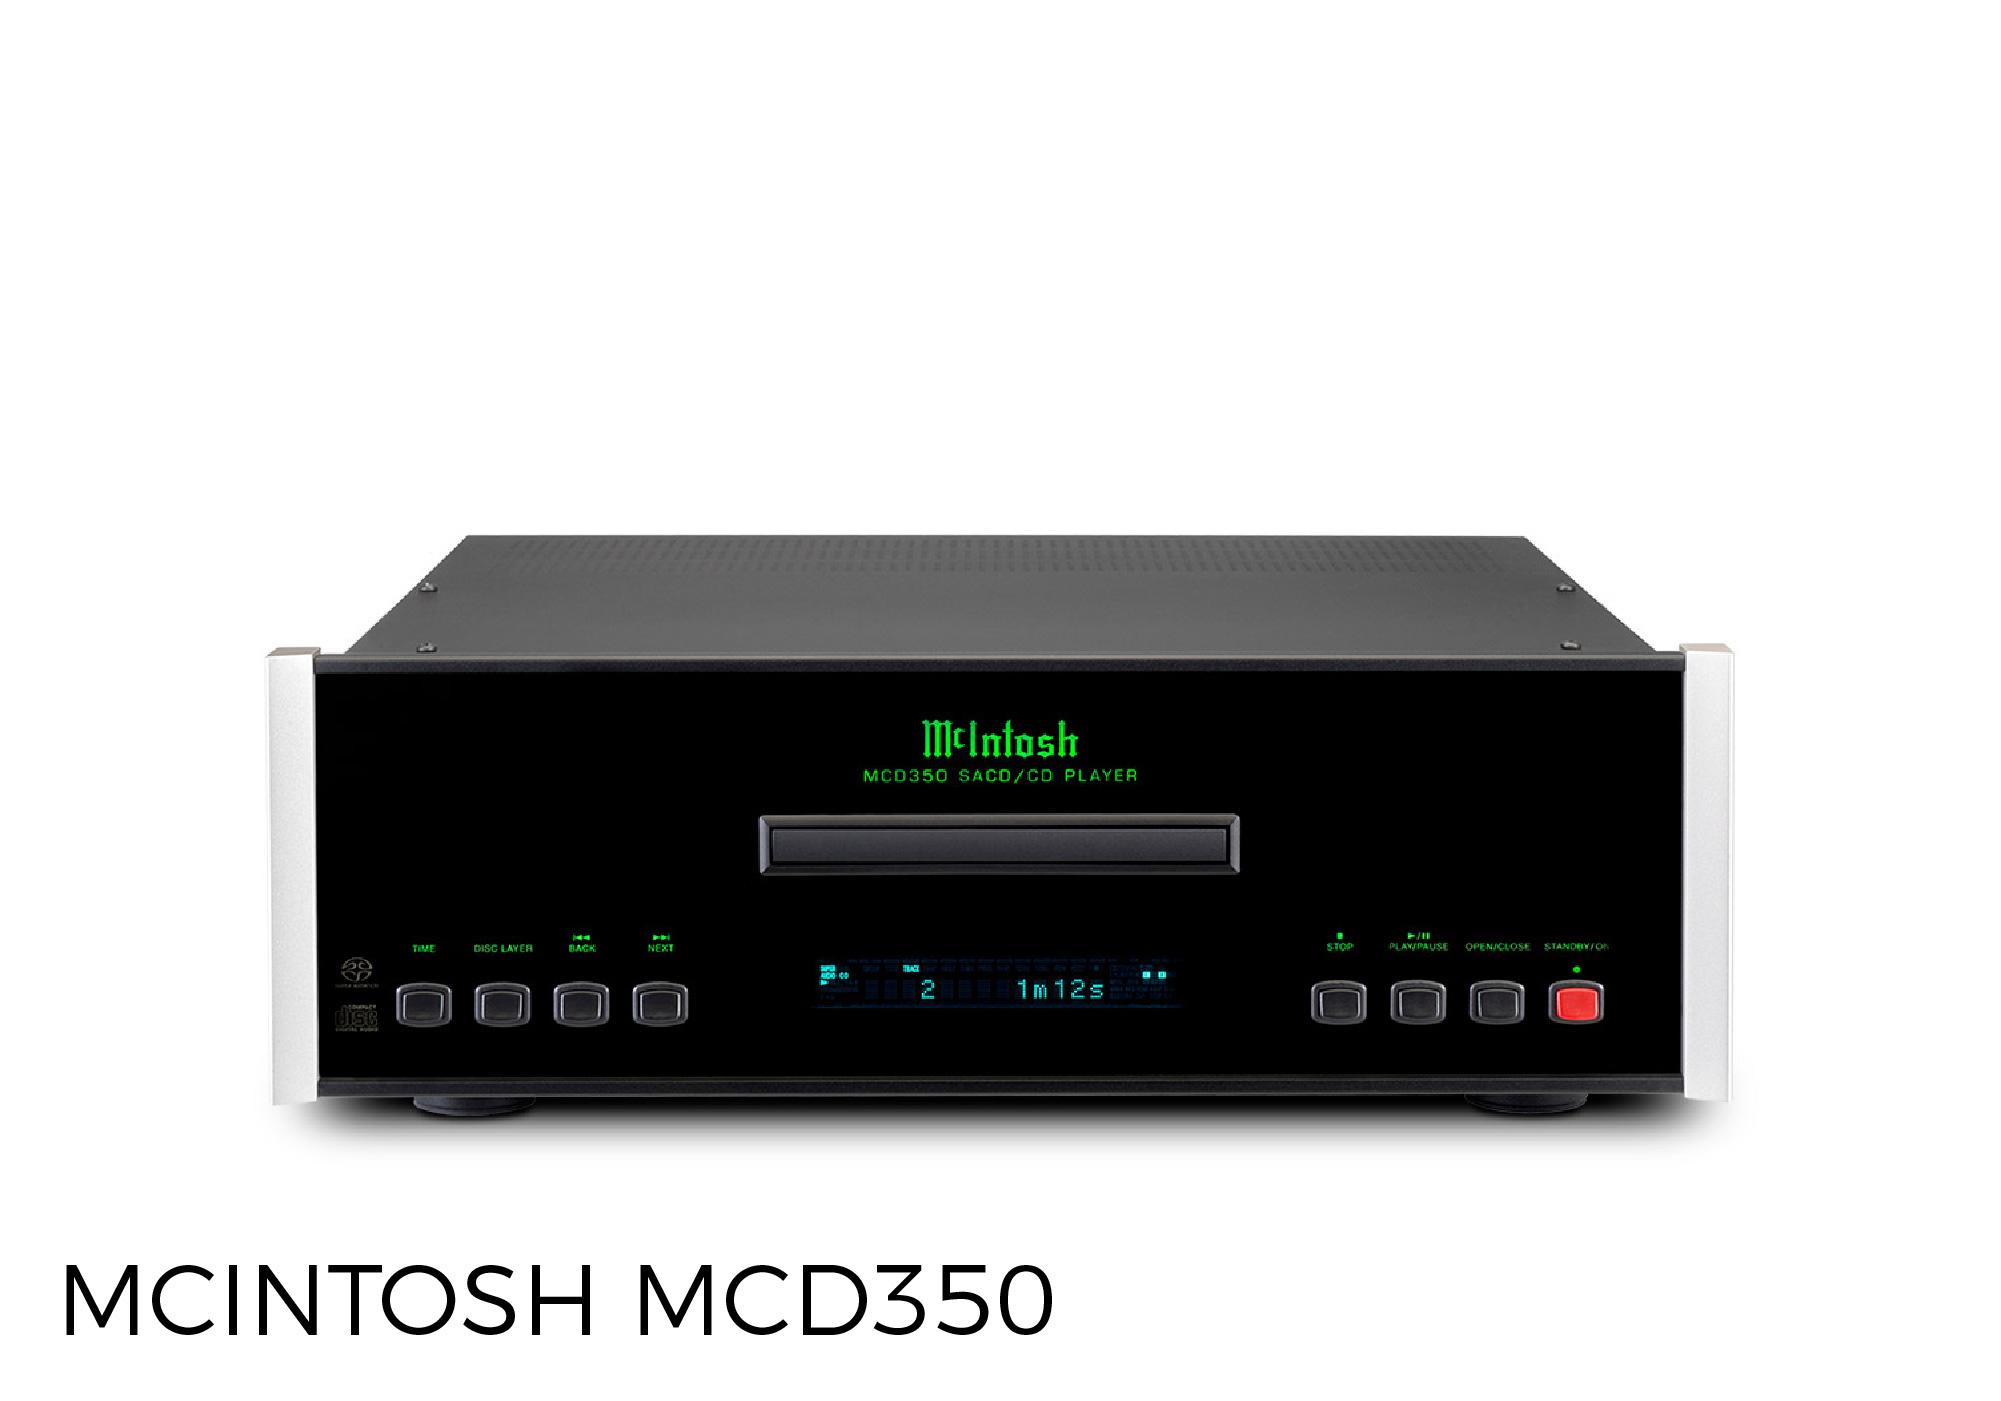 MCINTOSH MCD350 DONG THANH - HOA PHUC